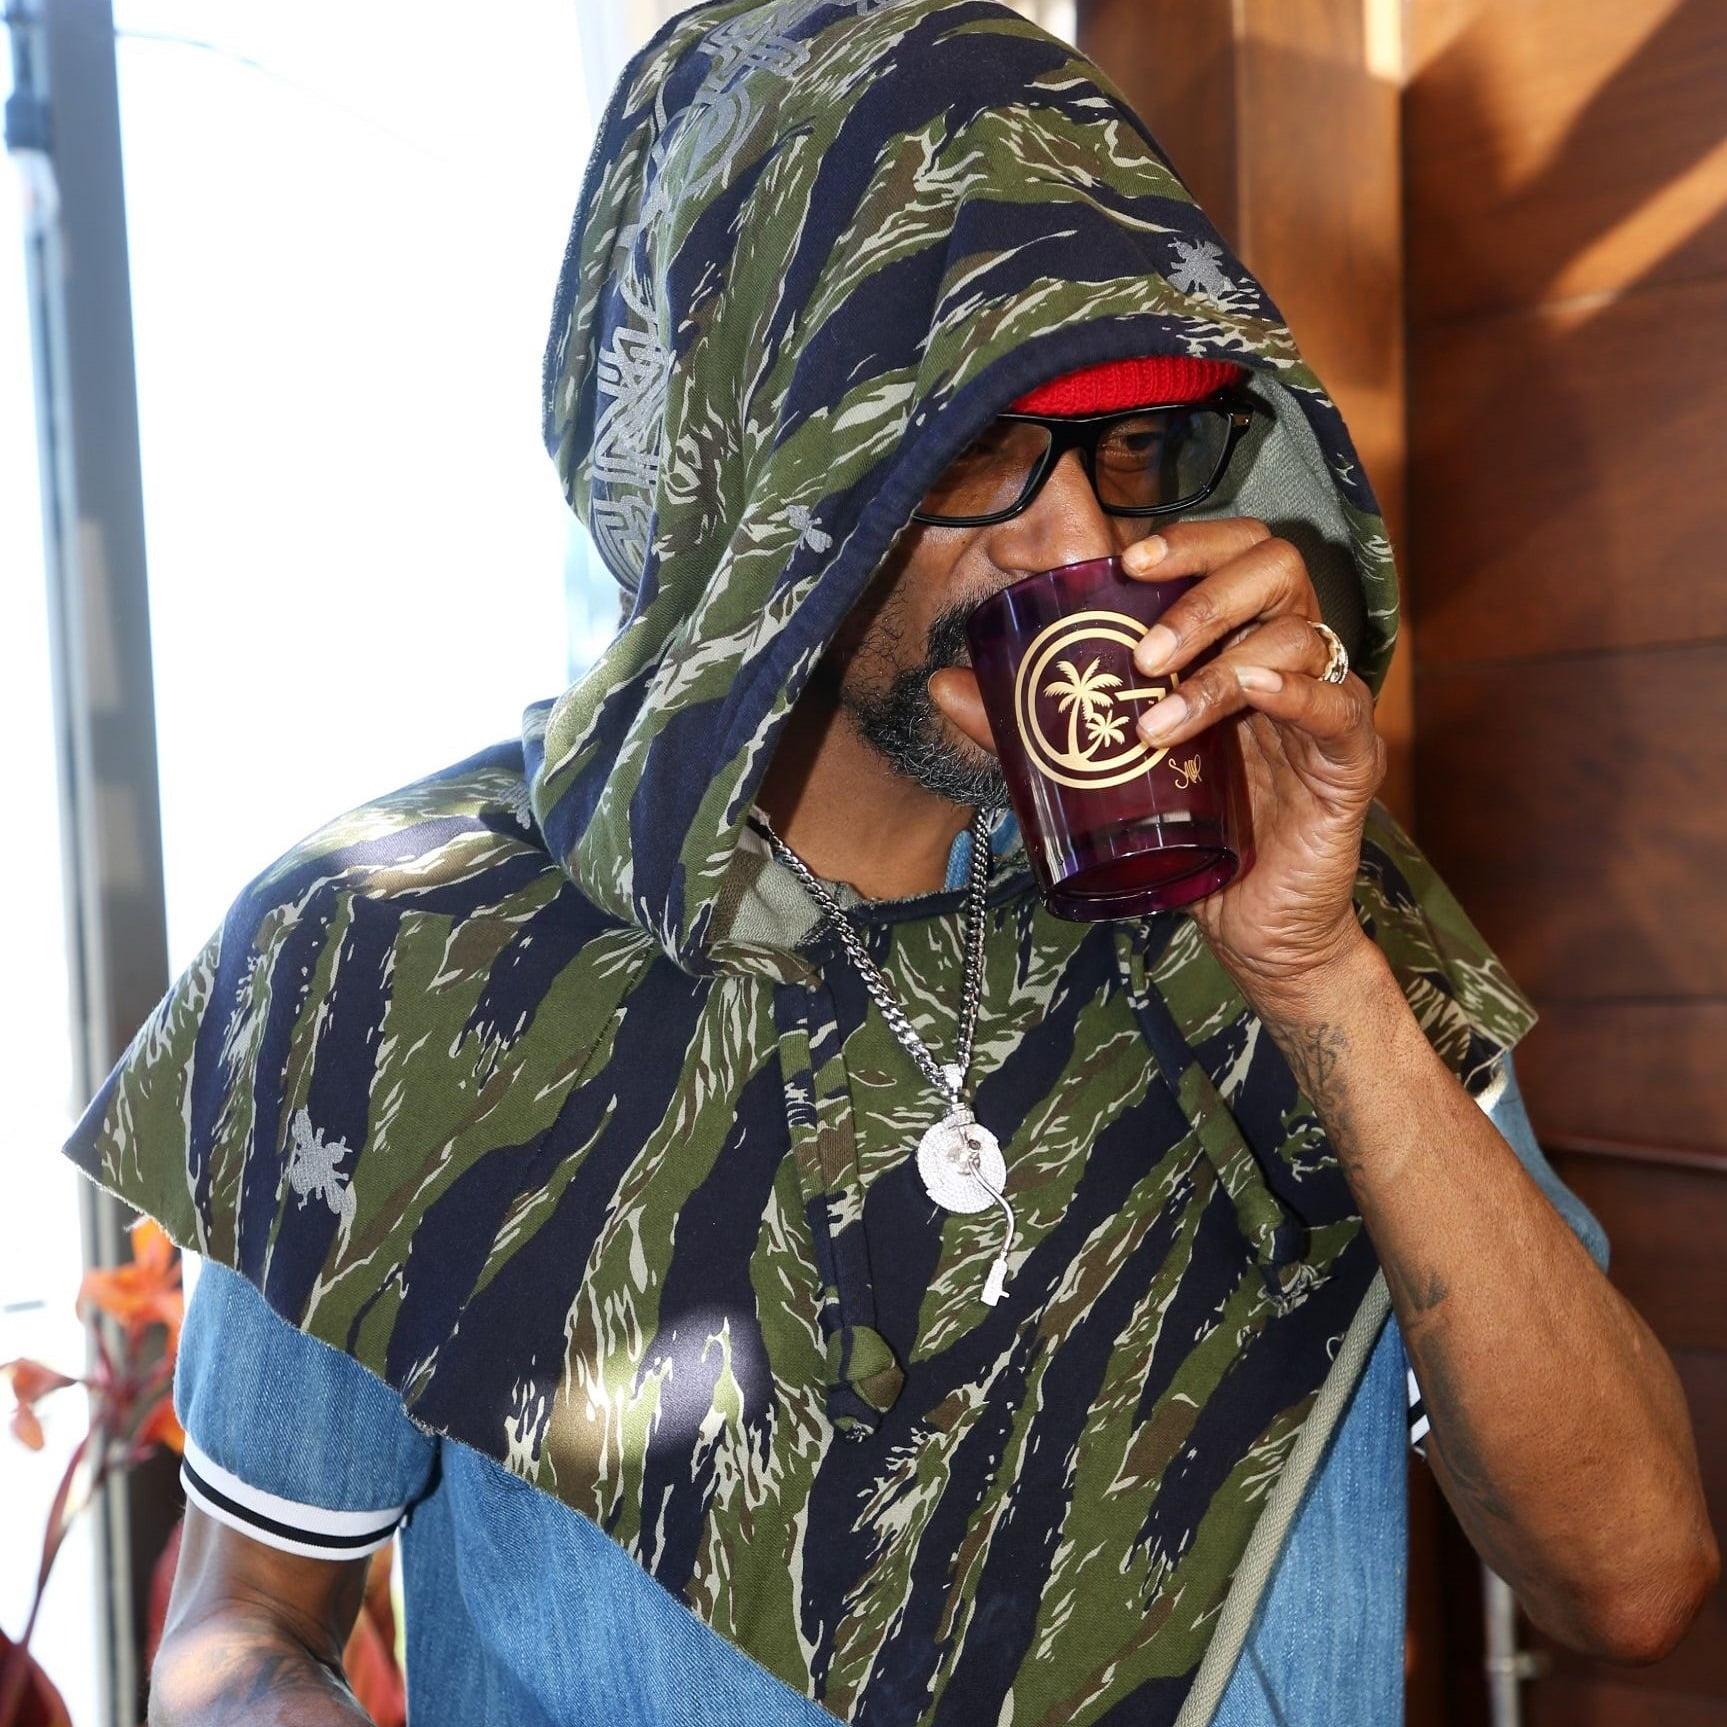 Snoop Dogg via Fingerprint Communications for use by 360 Magazine